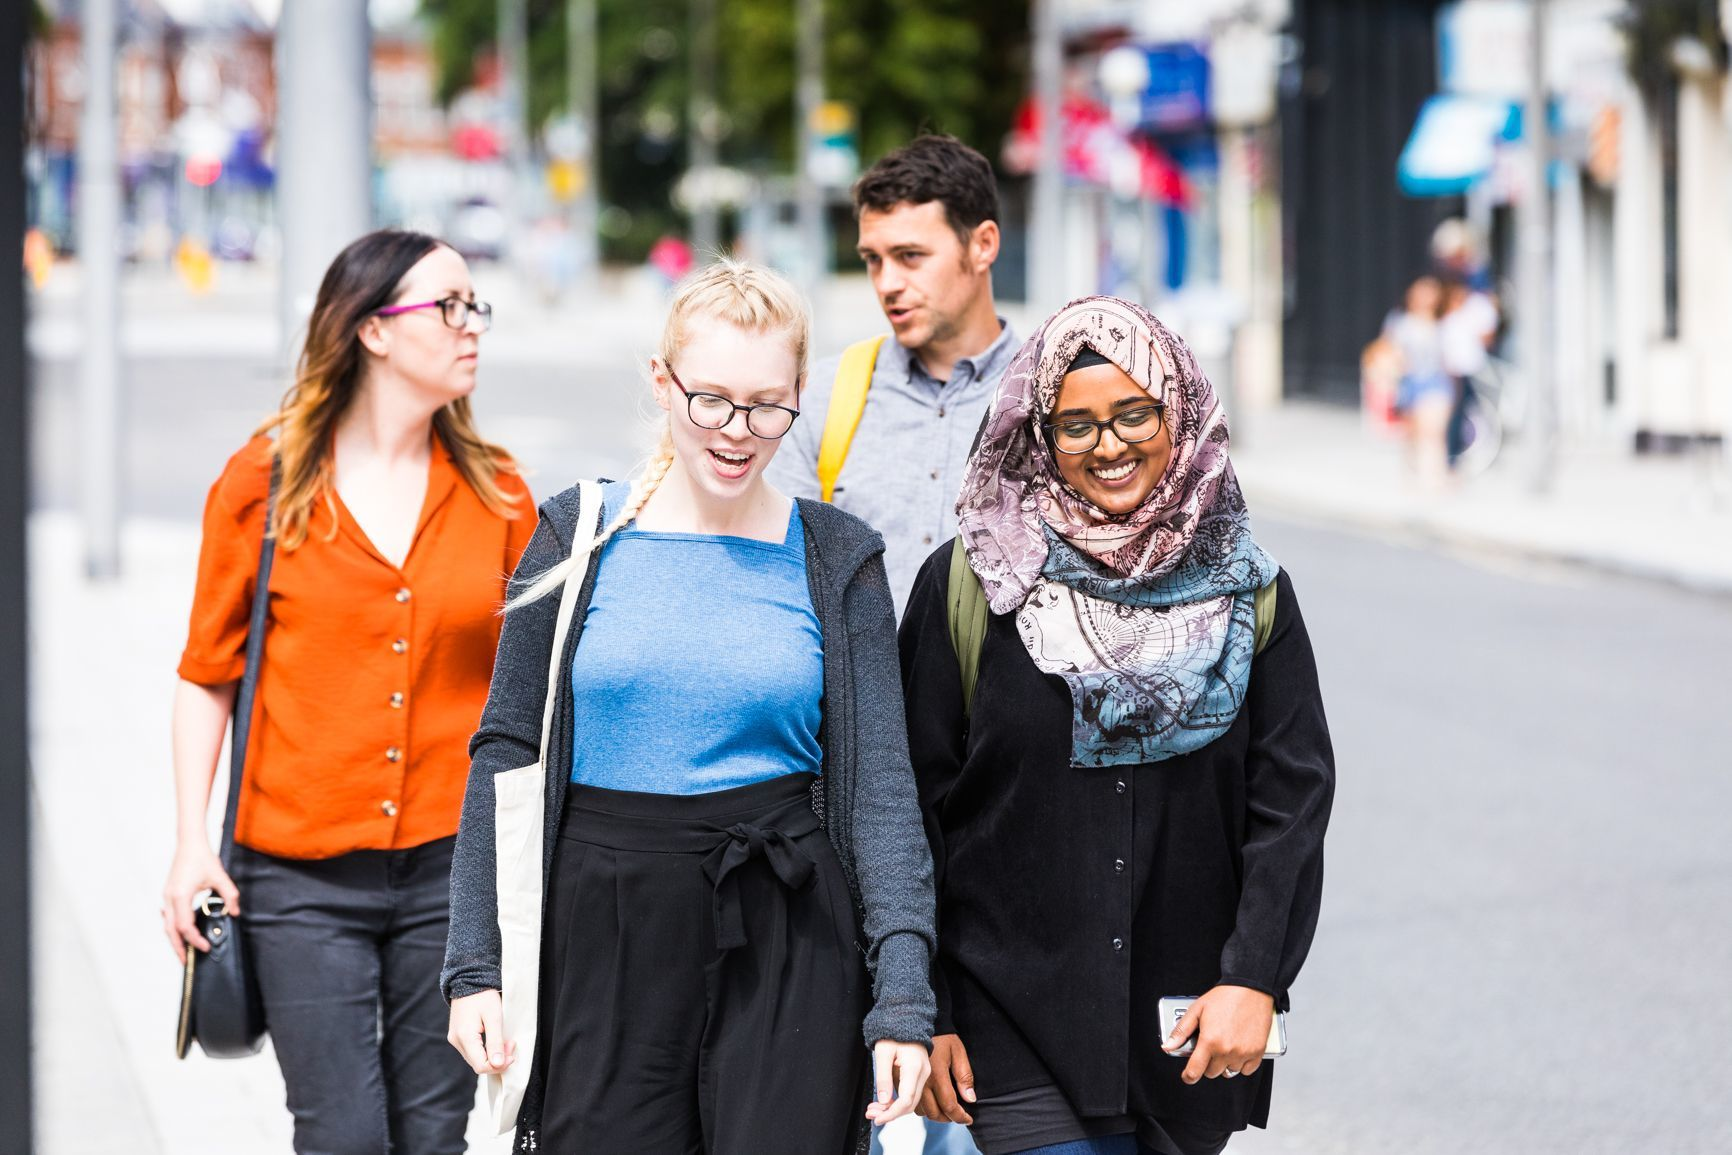 Group of friends walking down a street